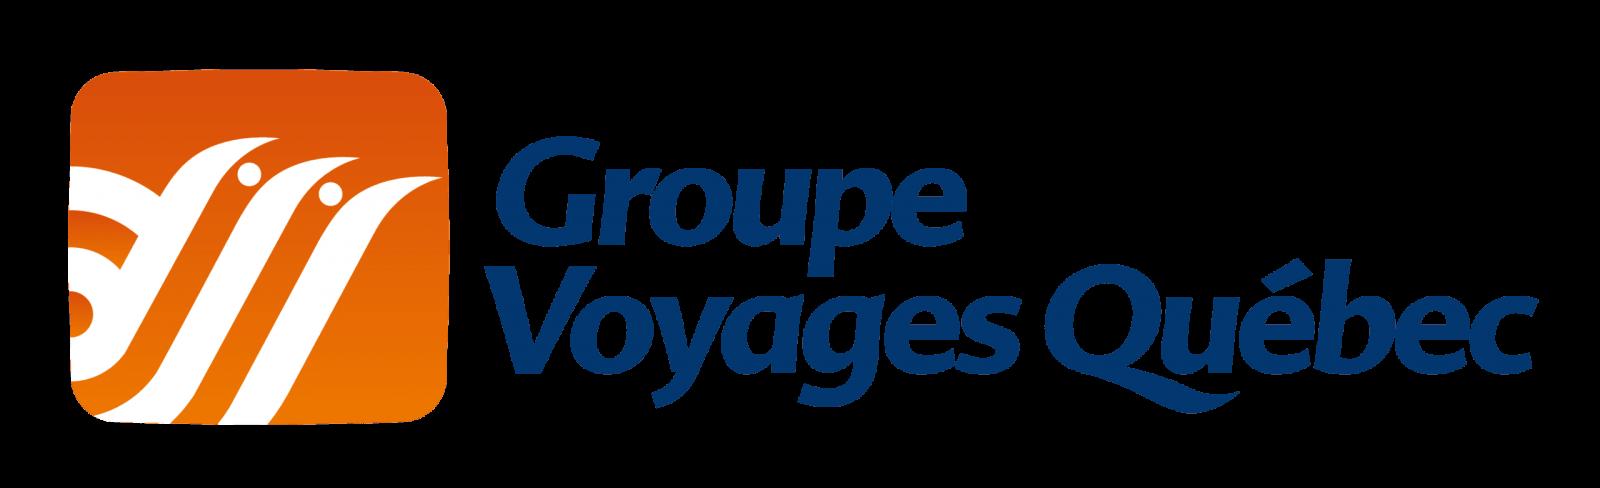 Groupe Voyages Quebec (GVQ) Logo